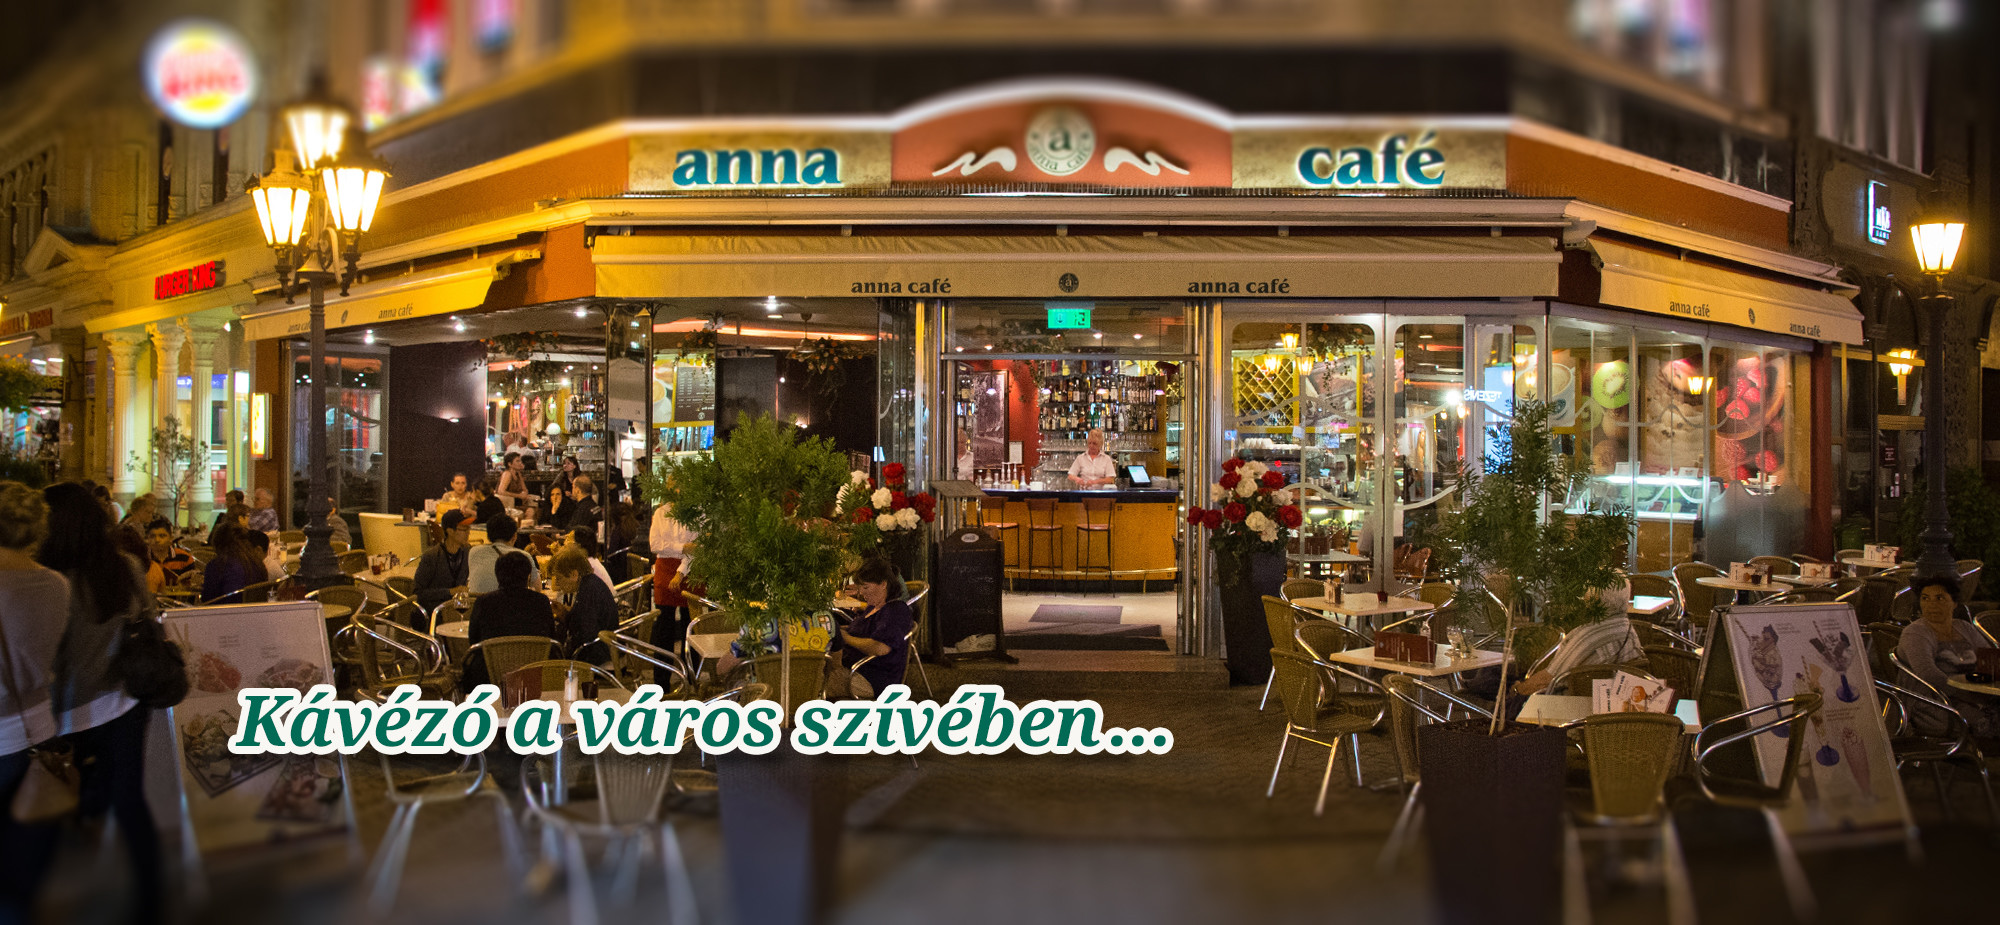 anna-vaci-este-szoveges